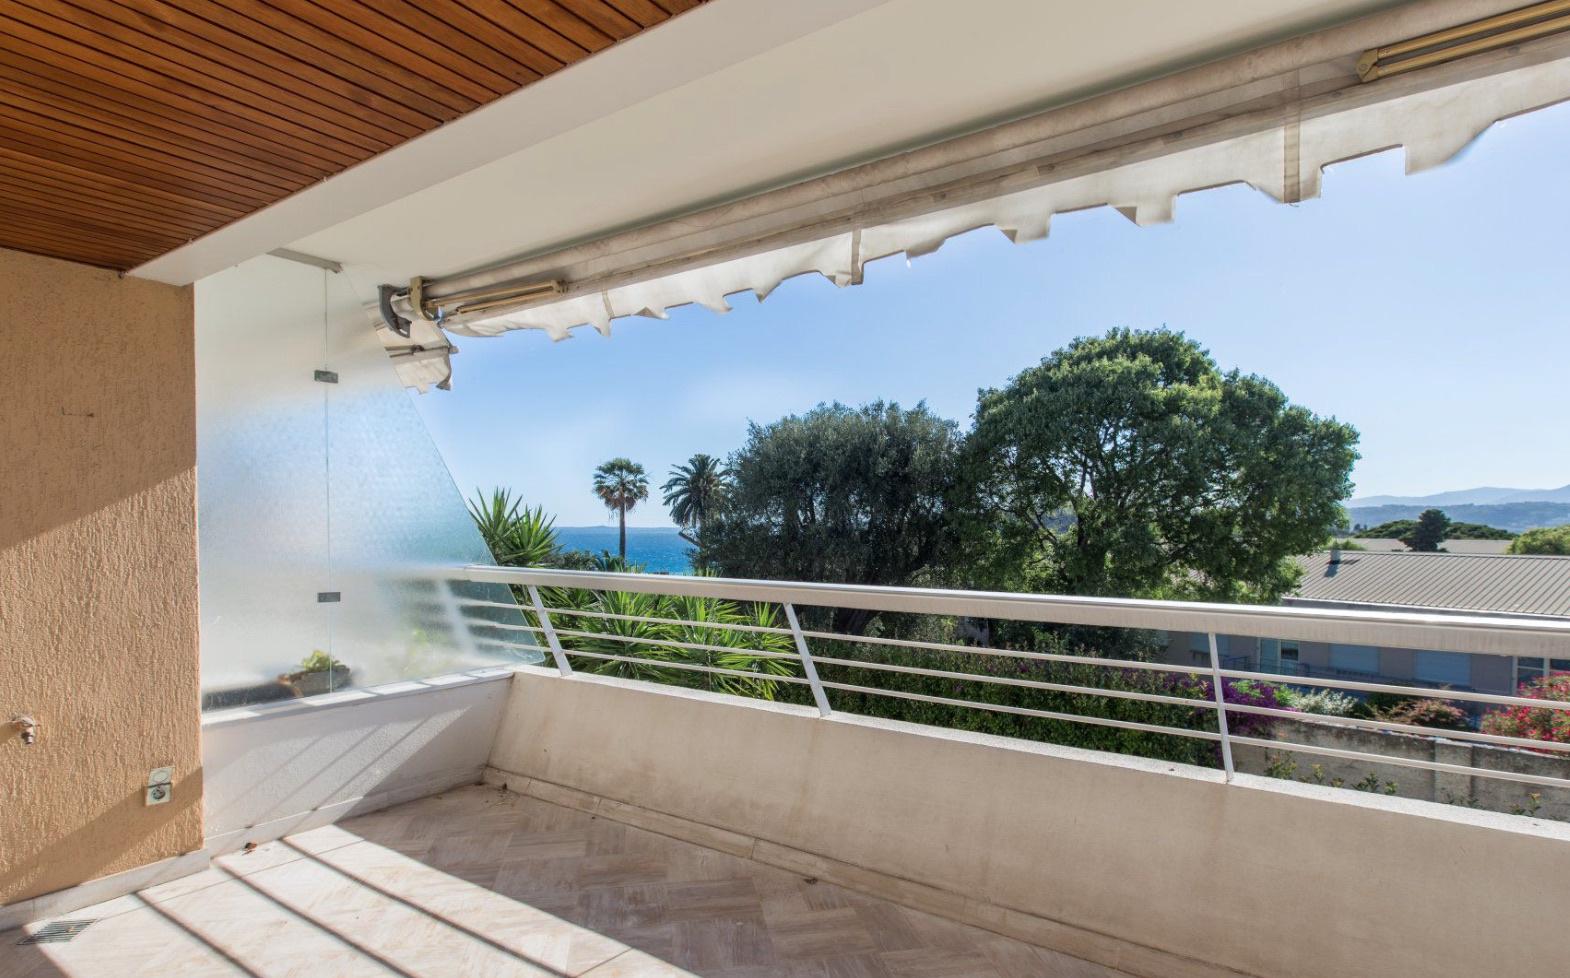 Vente nice mont boron 3p 60m2 terrasse piscine for Piscine nice